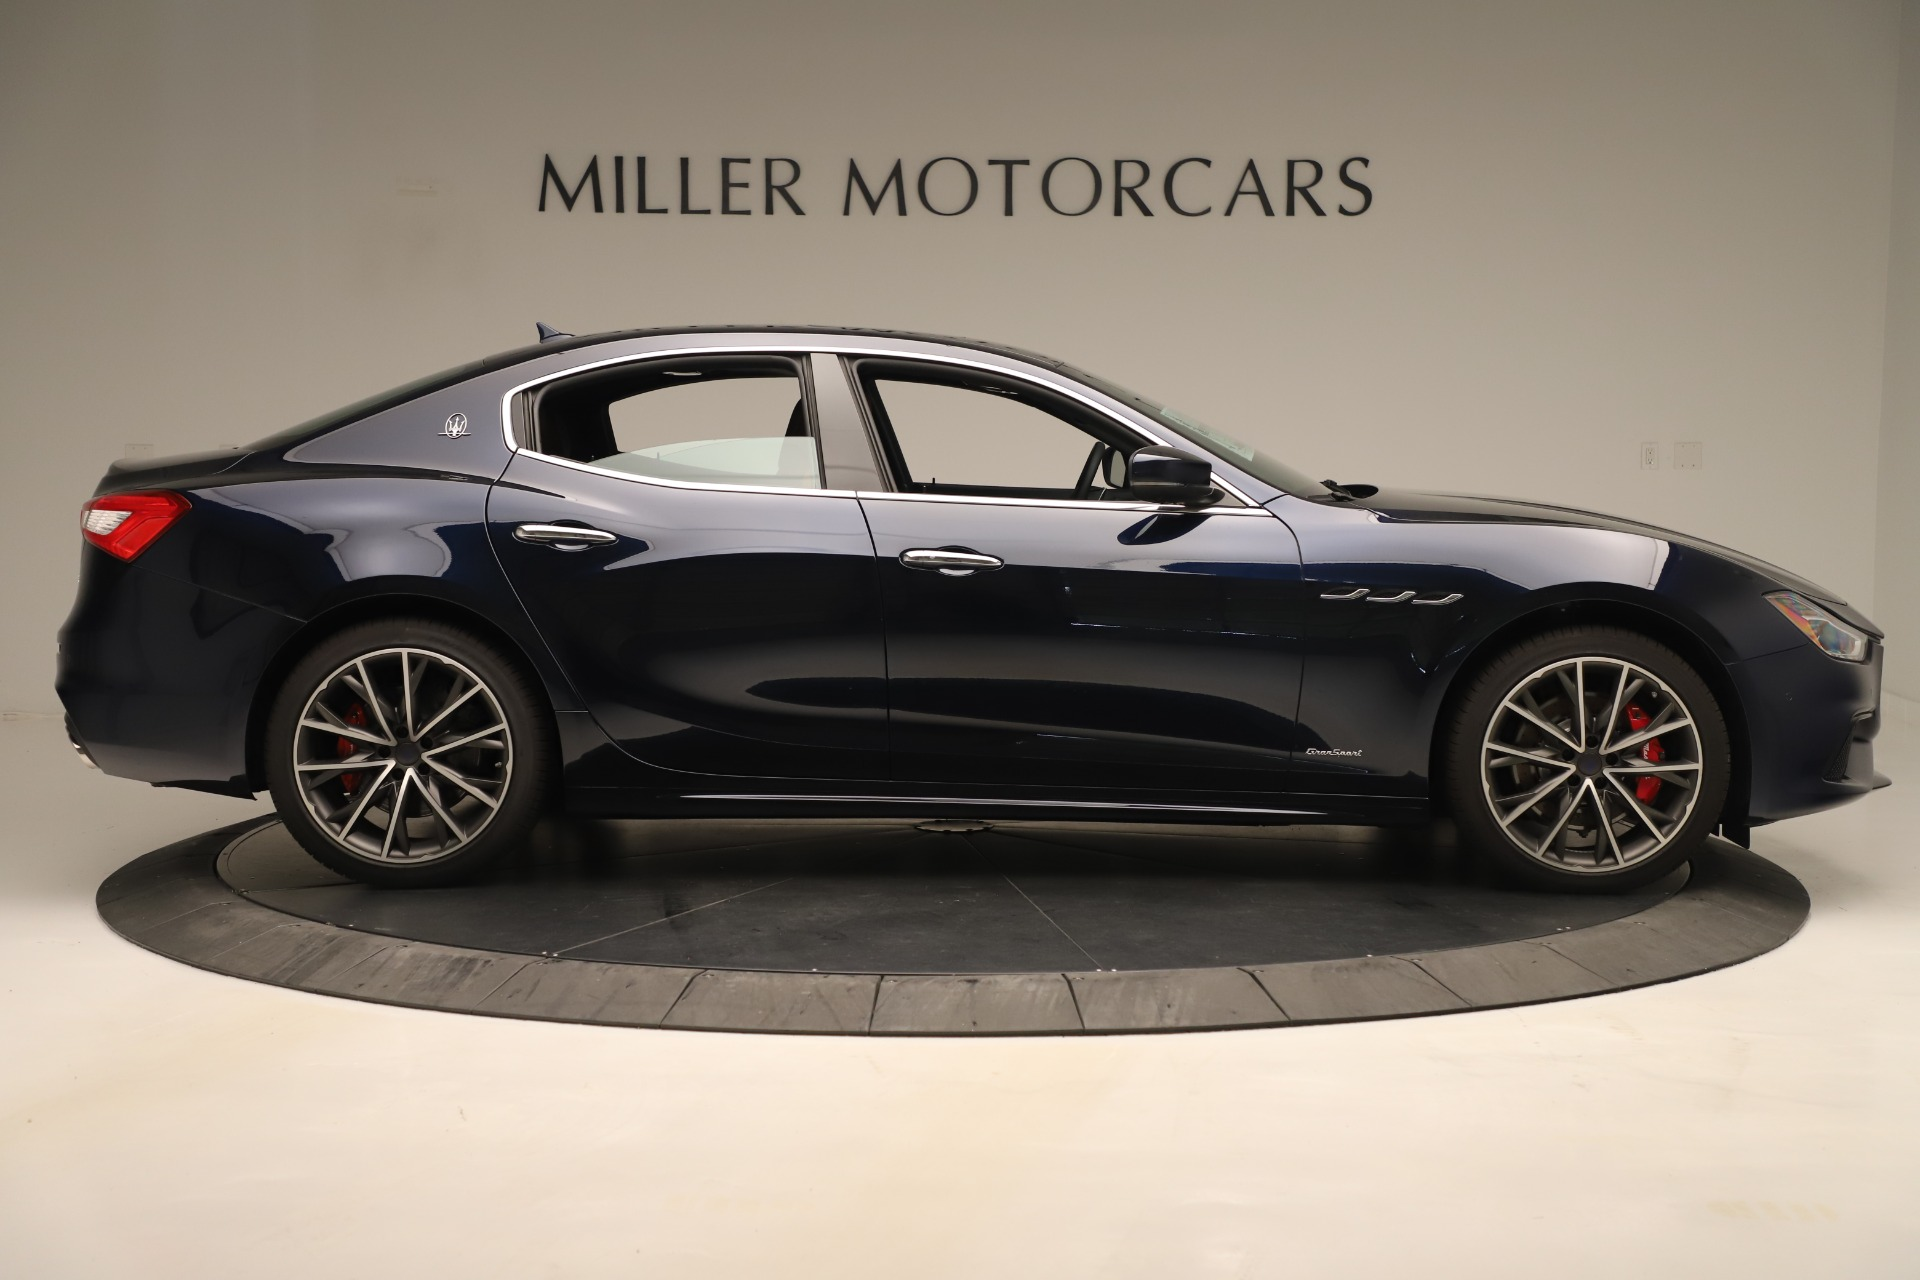 New 2019 Maserati Ghibli S Q4 GranSport For Sale 94545 In Greenwich, CT